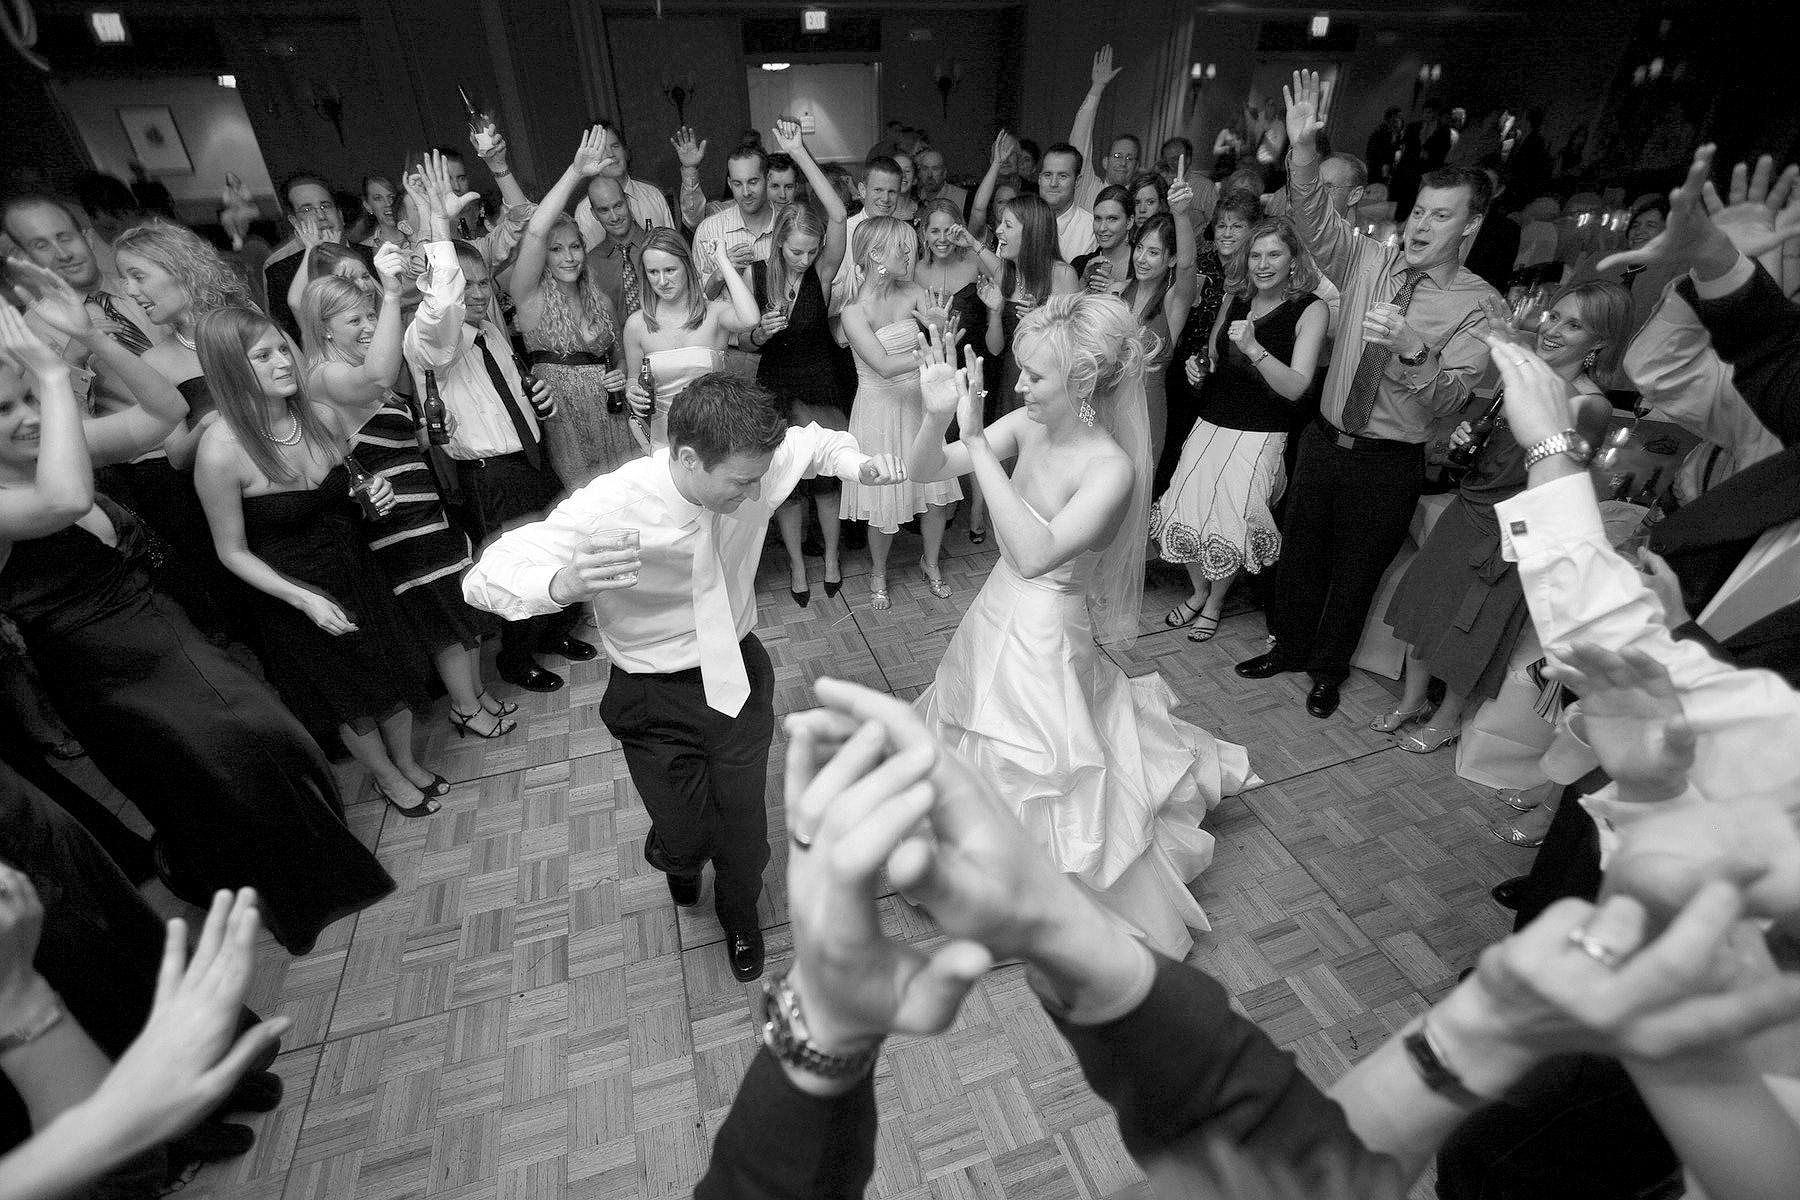 wedding-photography-saint-paul-mark-kegans-609.jpg